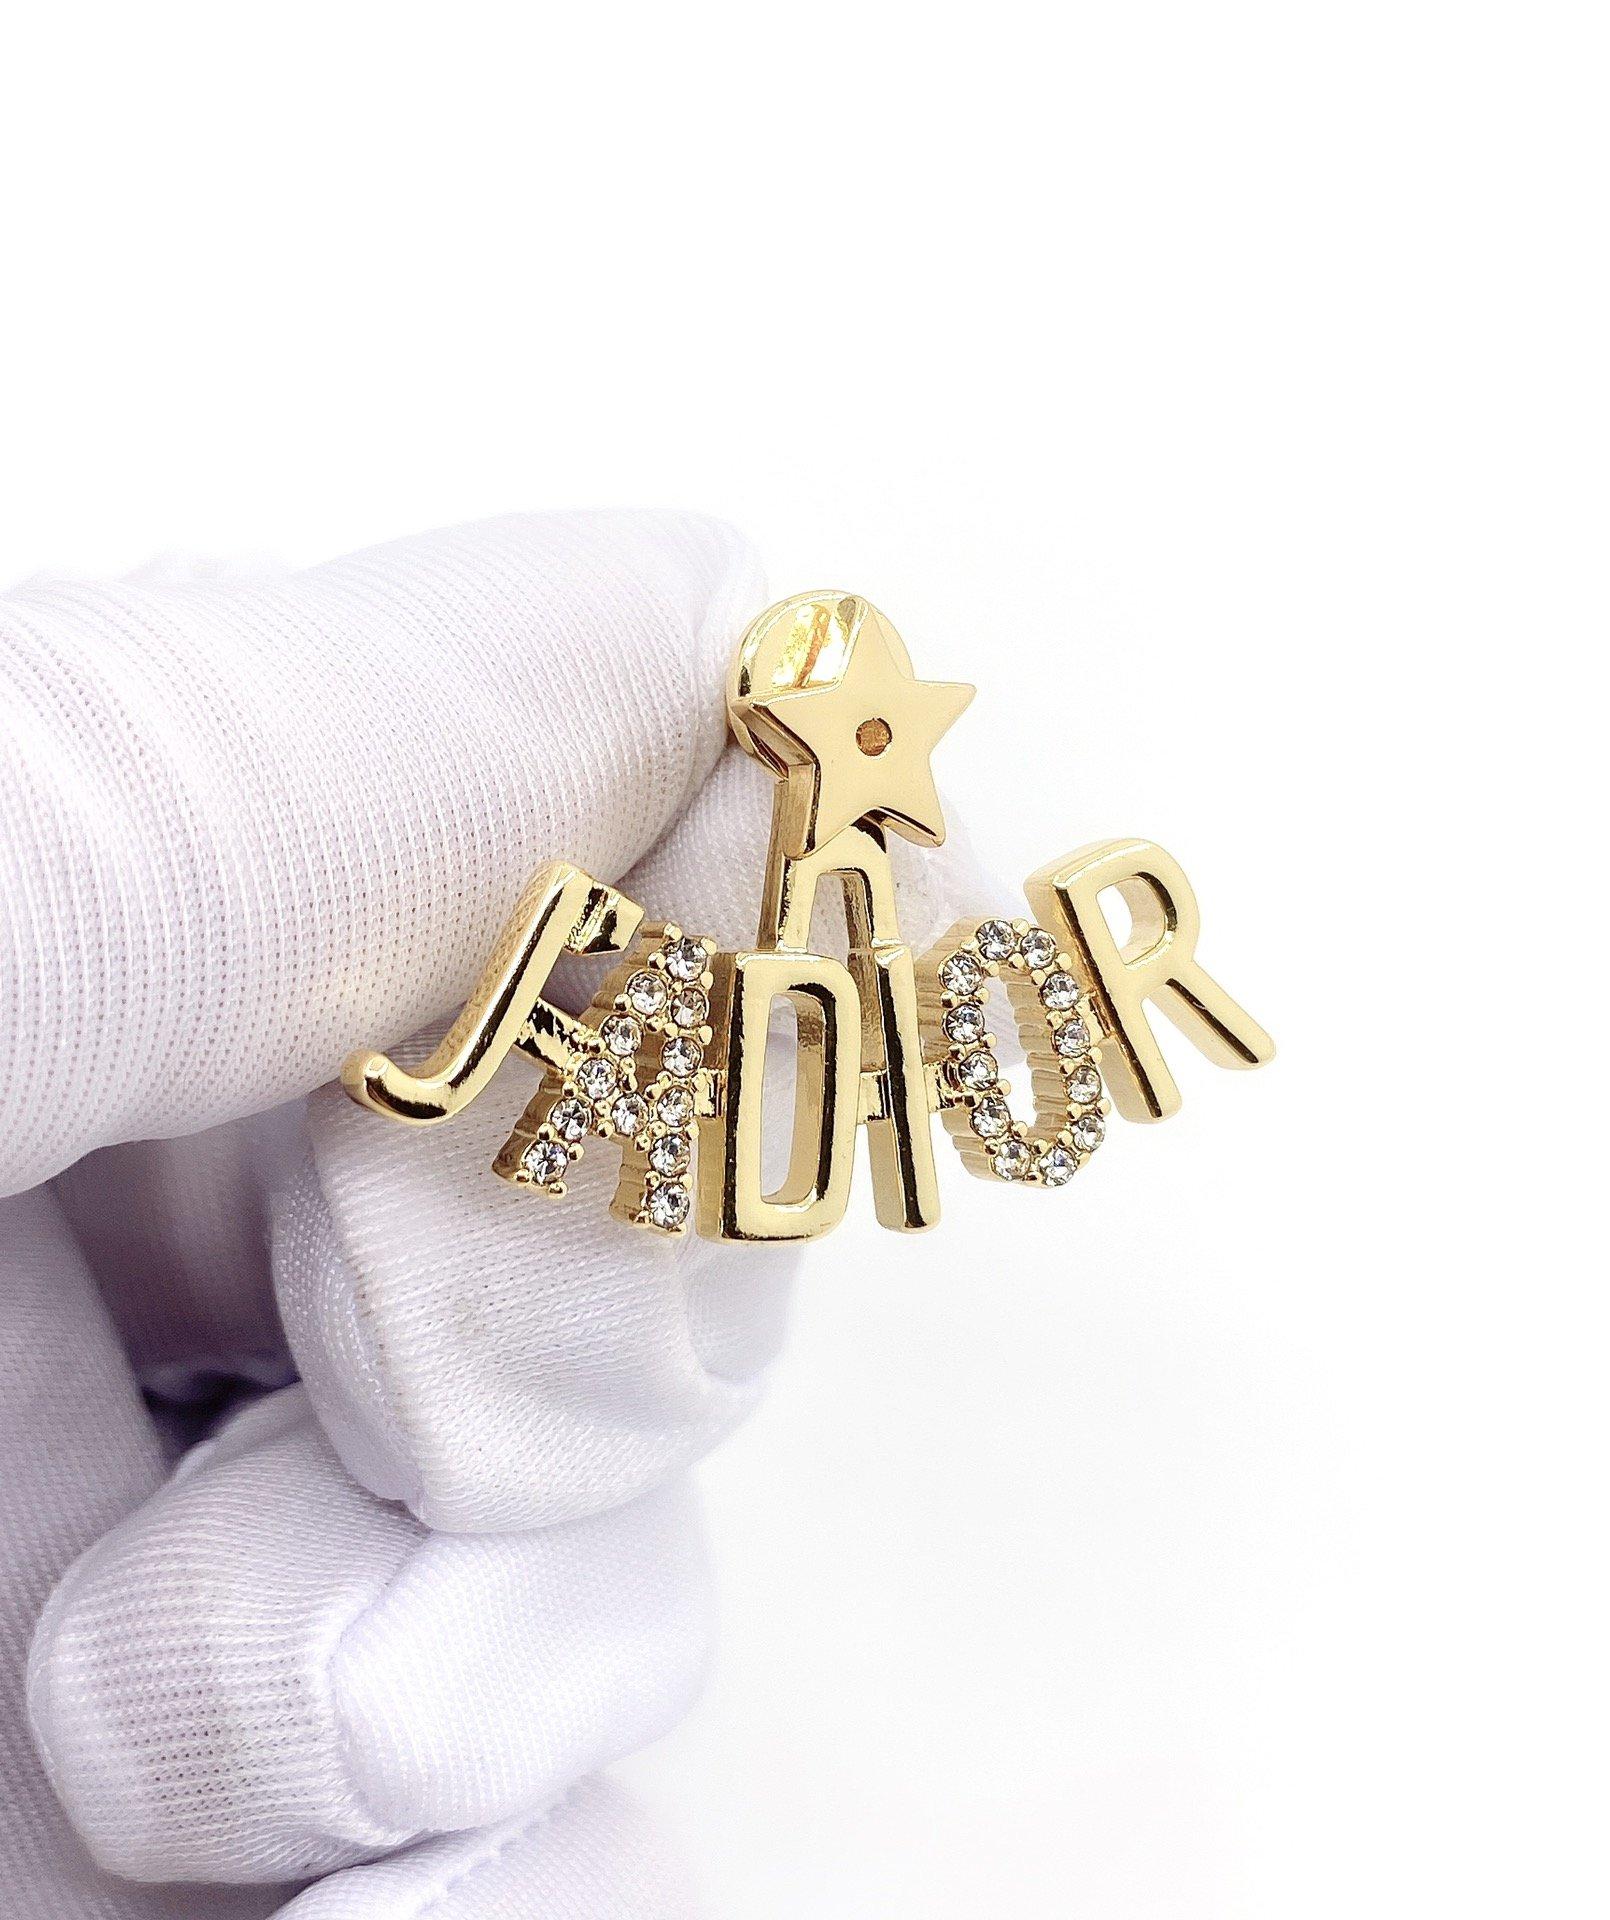 Di0r新款字母耳钉以醒目的金色金属